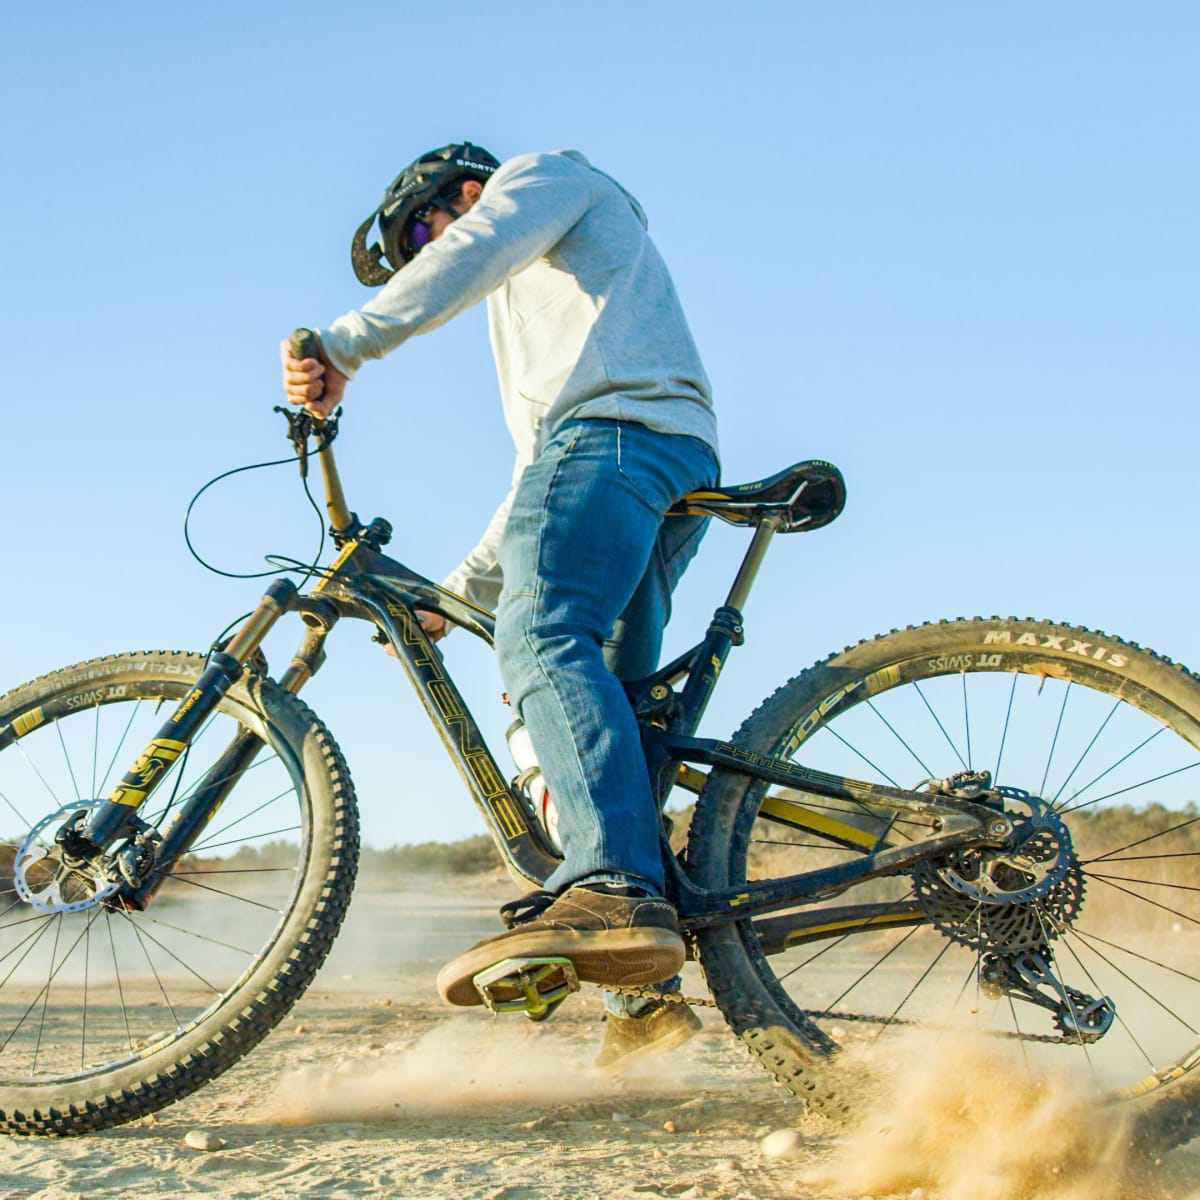 Man skidding through dirt.